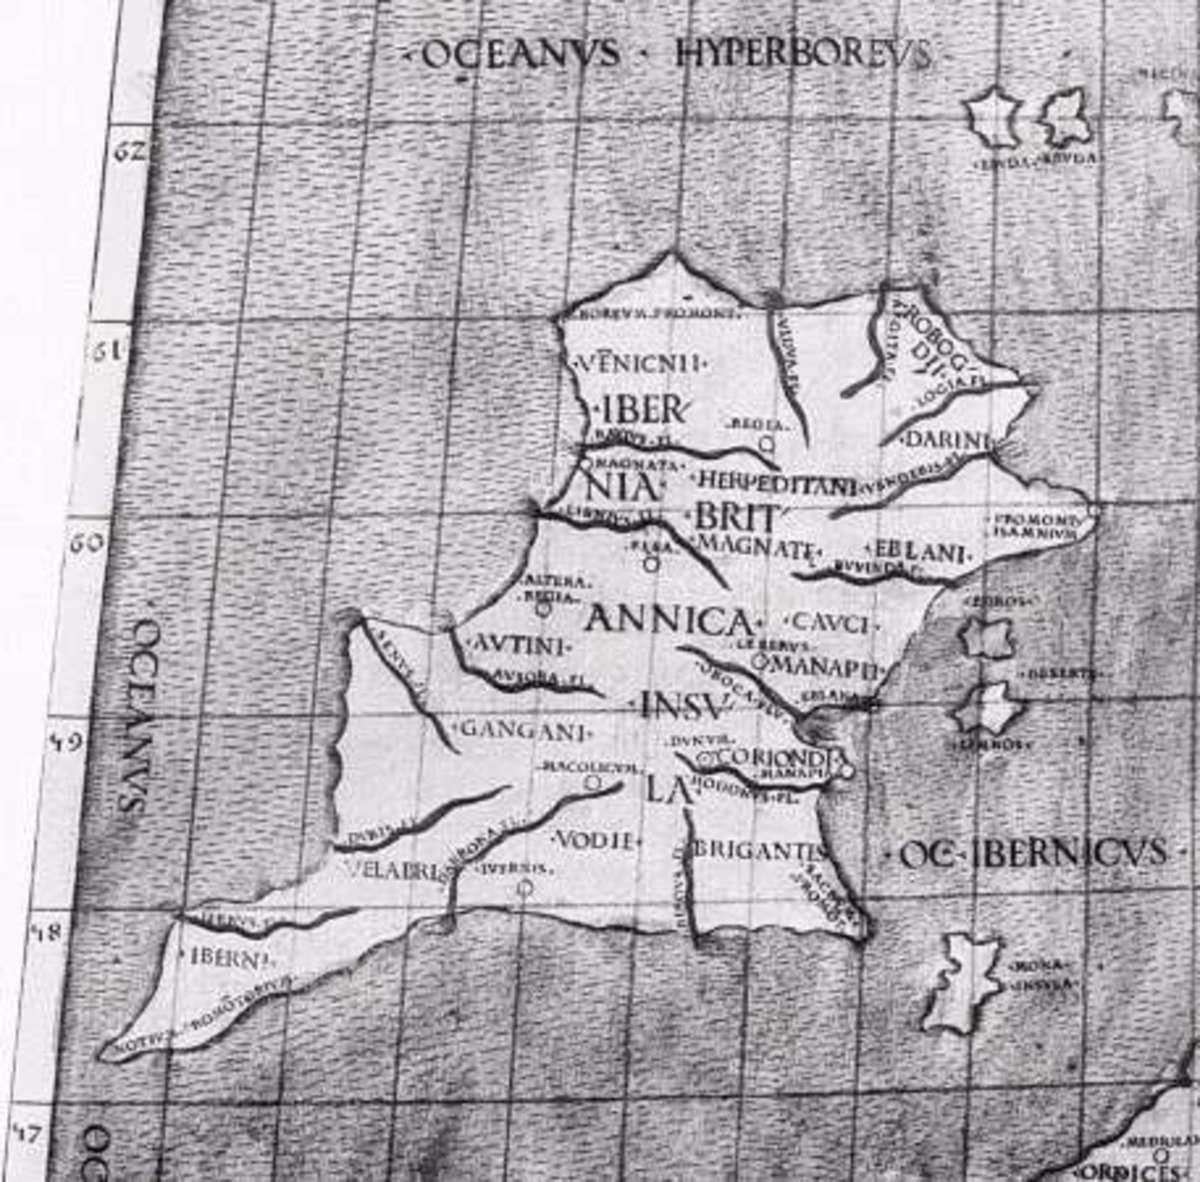 Ptolemy's map of Ireland, the regional names in Latin Roman script